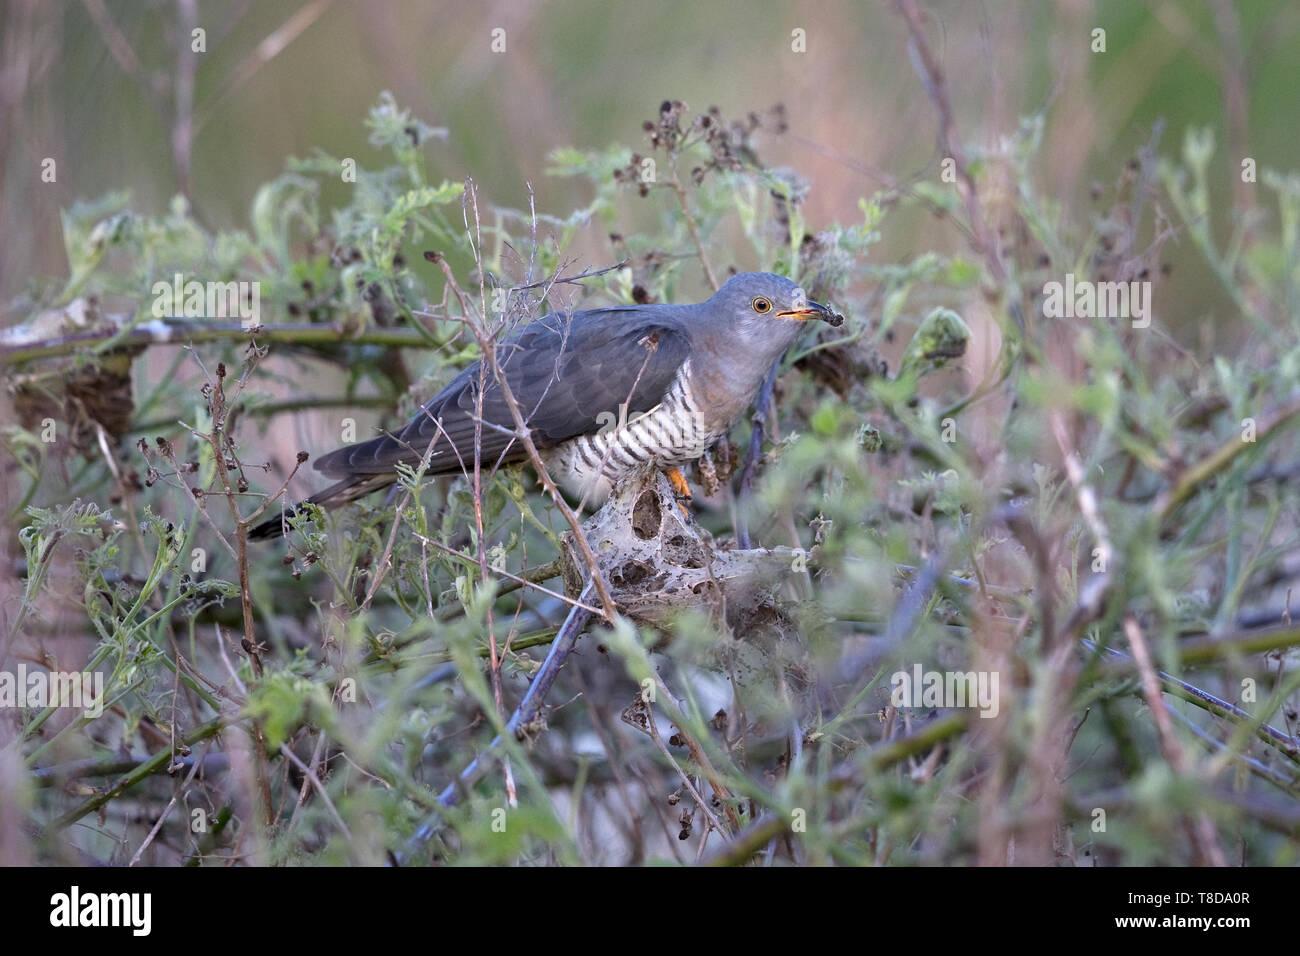 Common Cuckoo (Cuculus canorus) - Stock Image